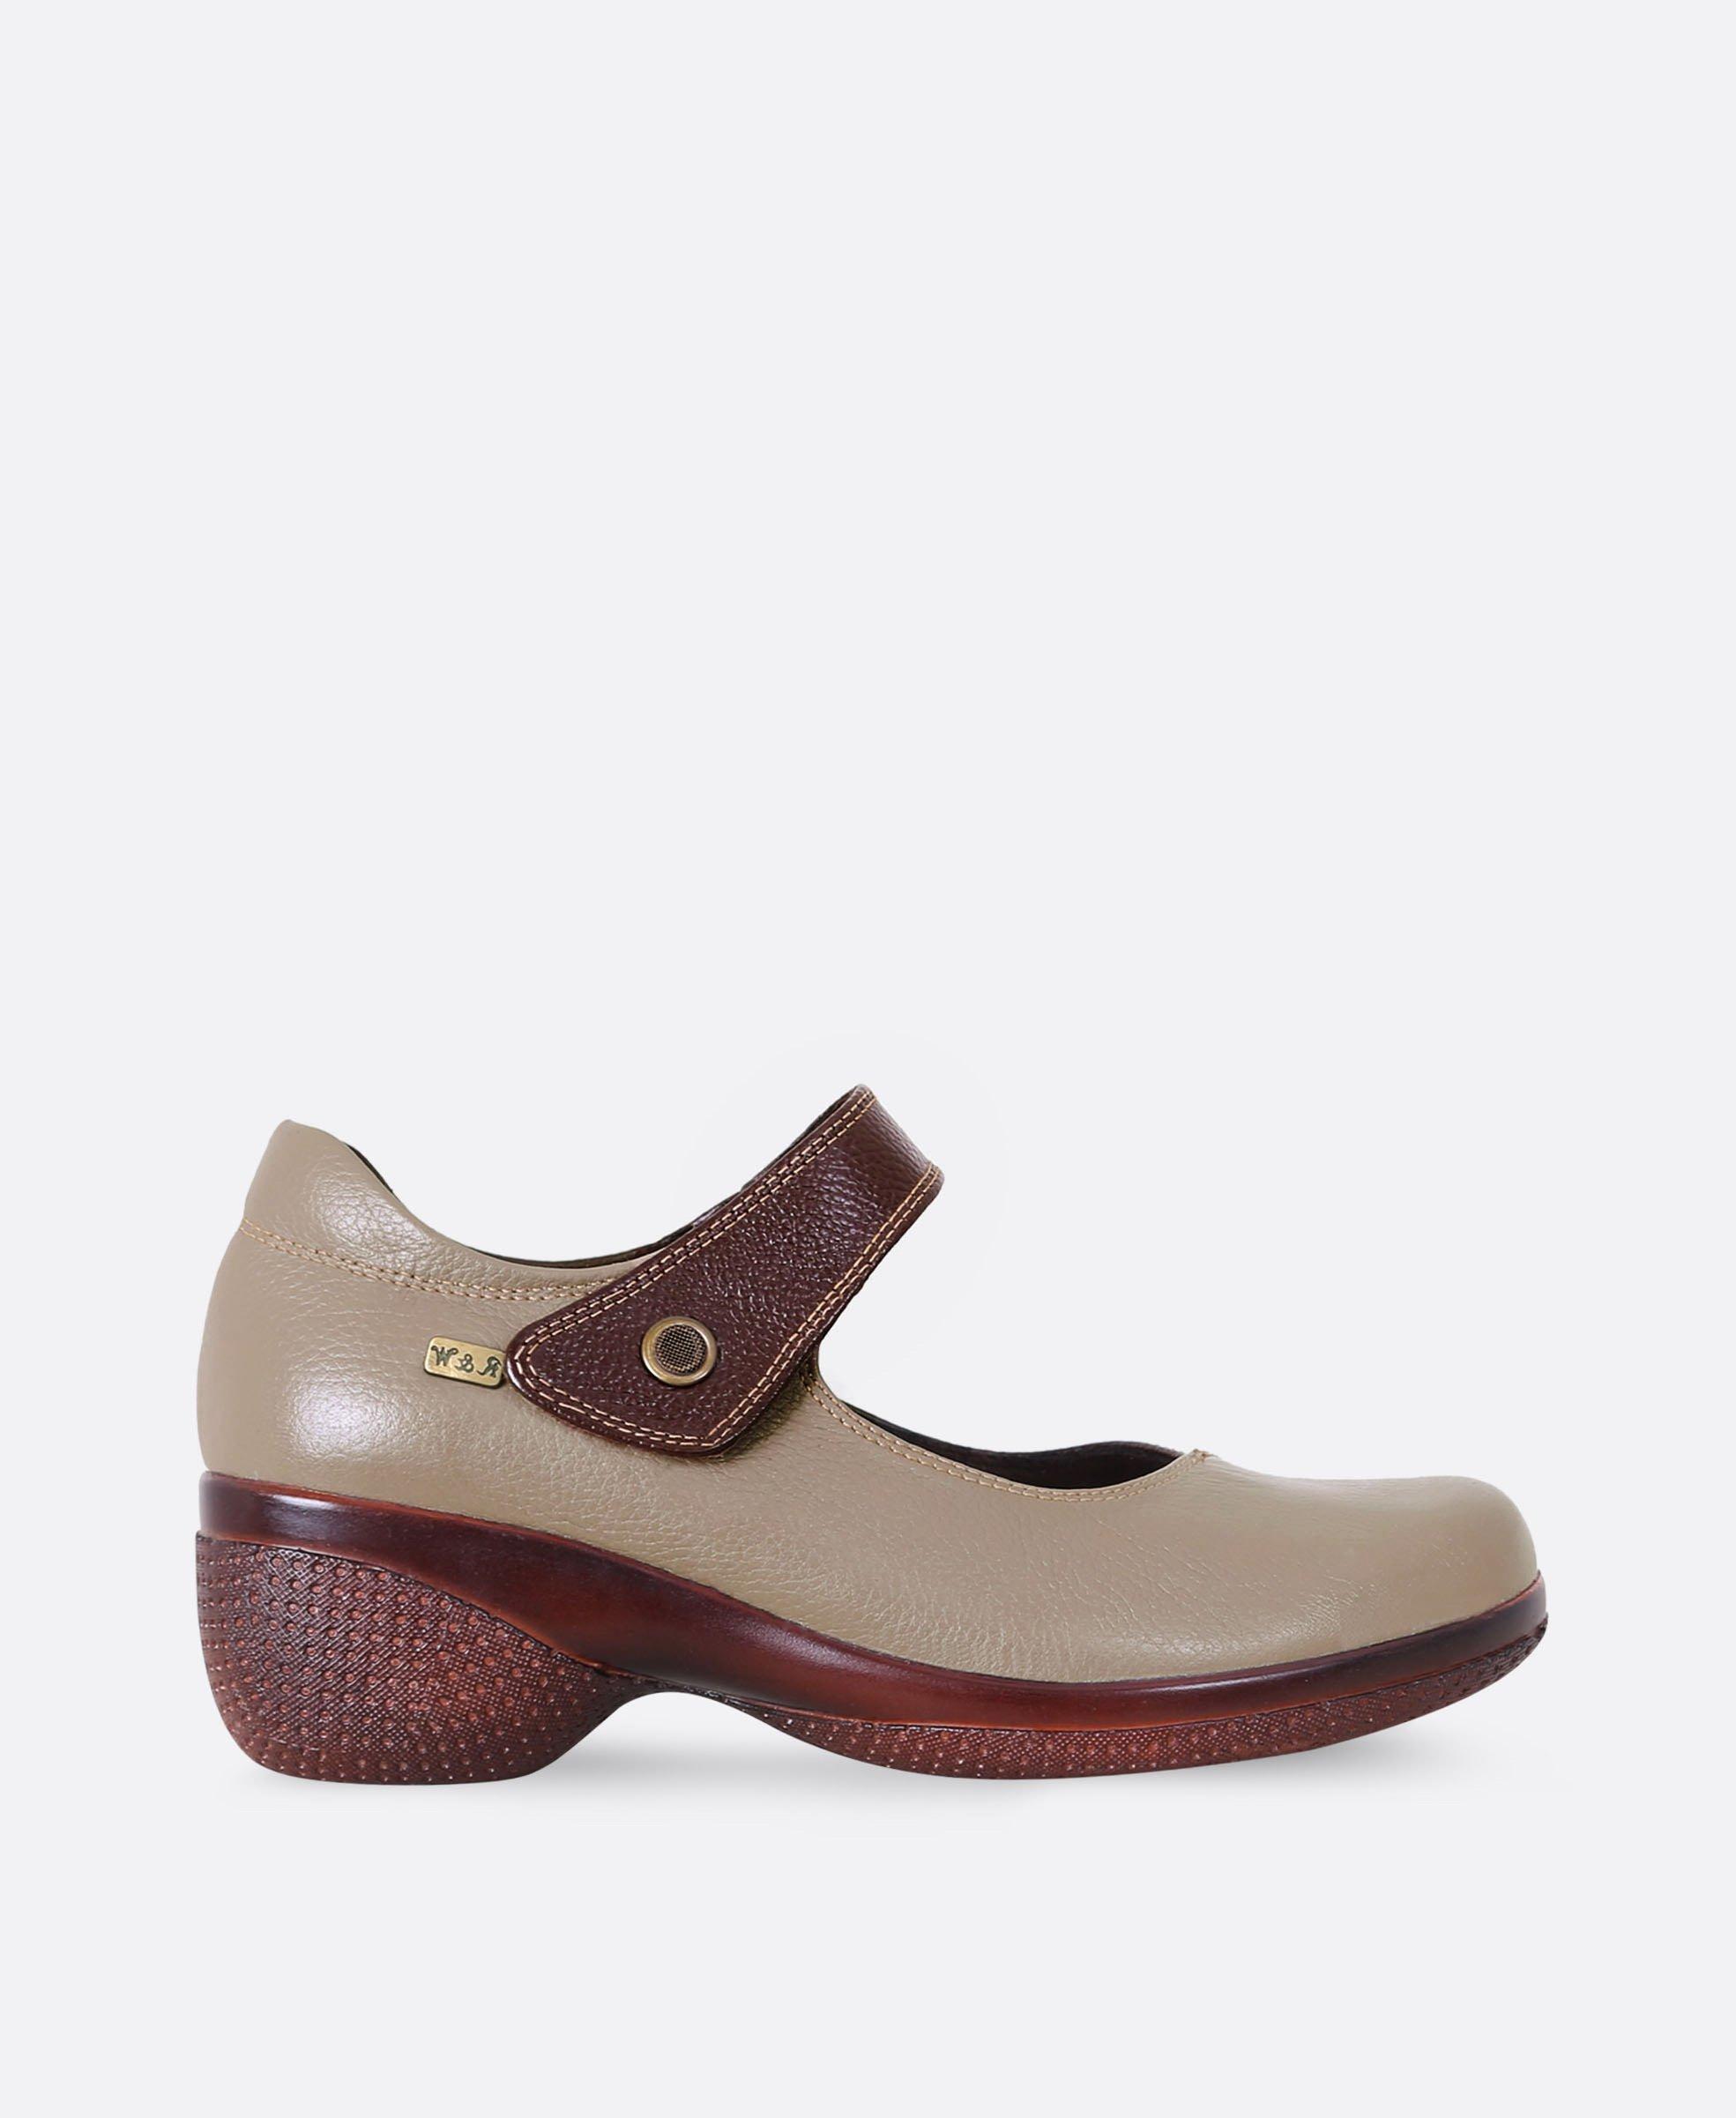 کفش زنانه چرم 0095